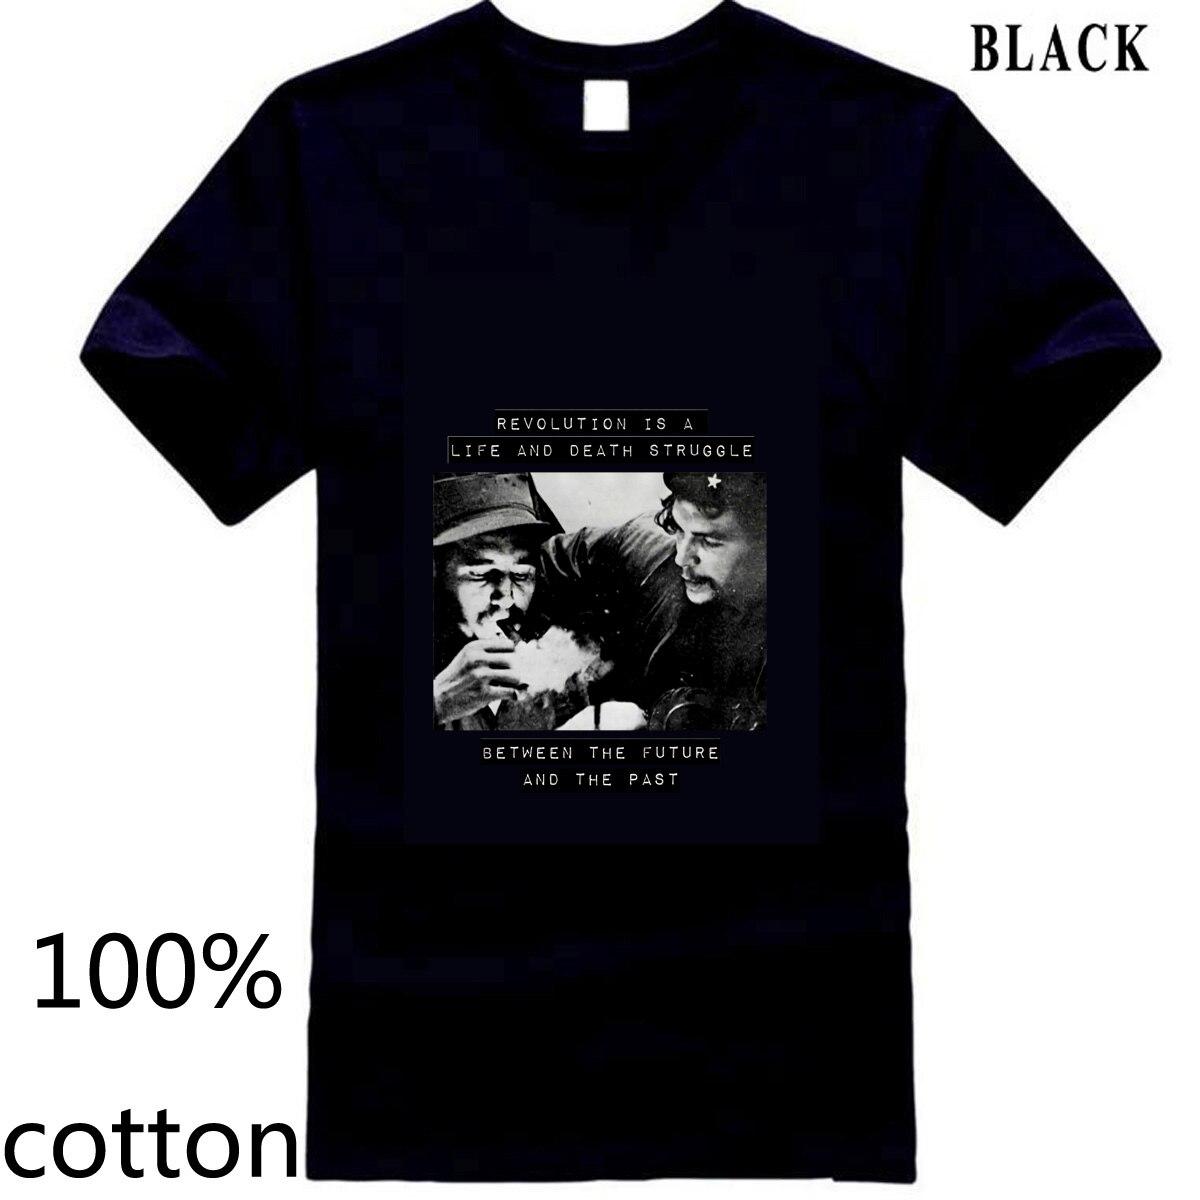 Fidel Castro Che Guevara comunista soviético BLM Black Lives Cool hombres camiseta tops camisetas 100% algodón